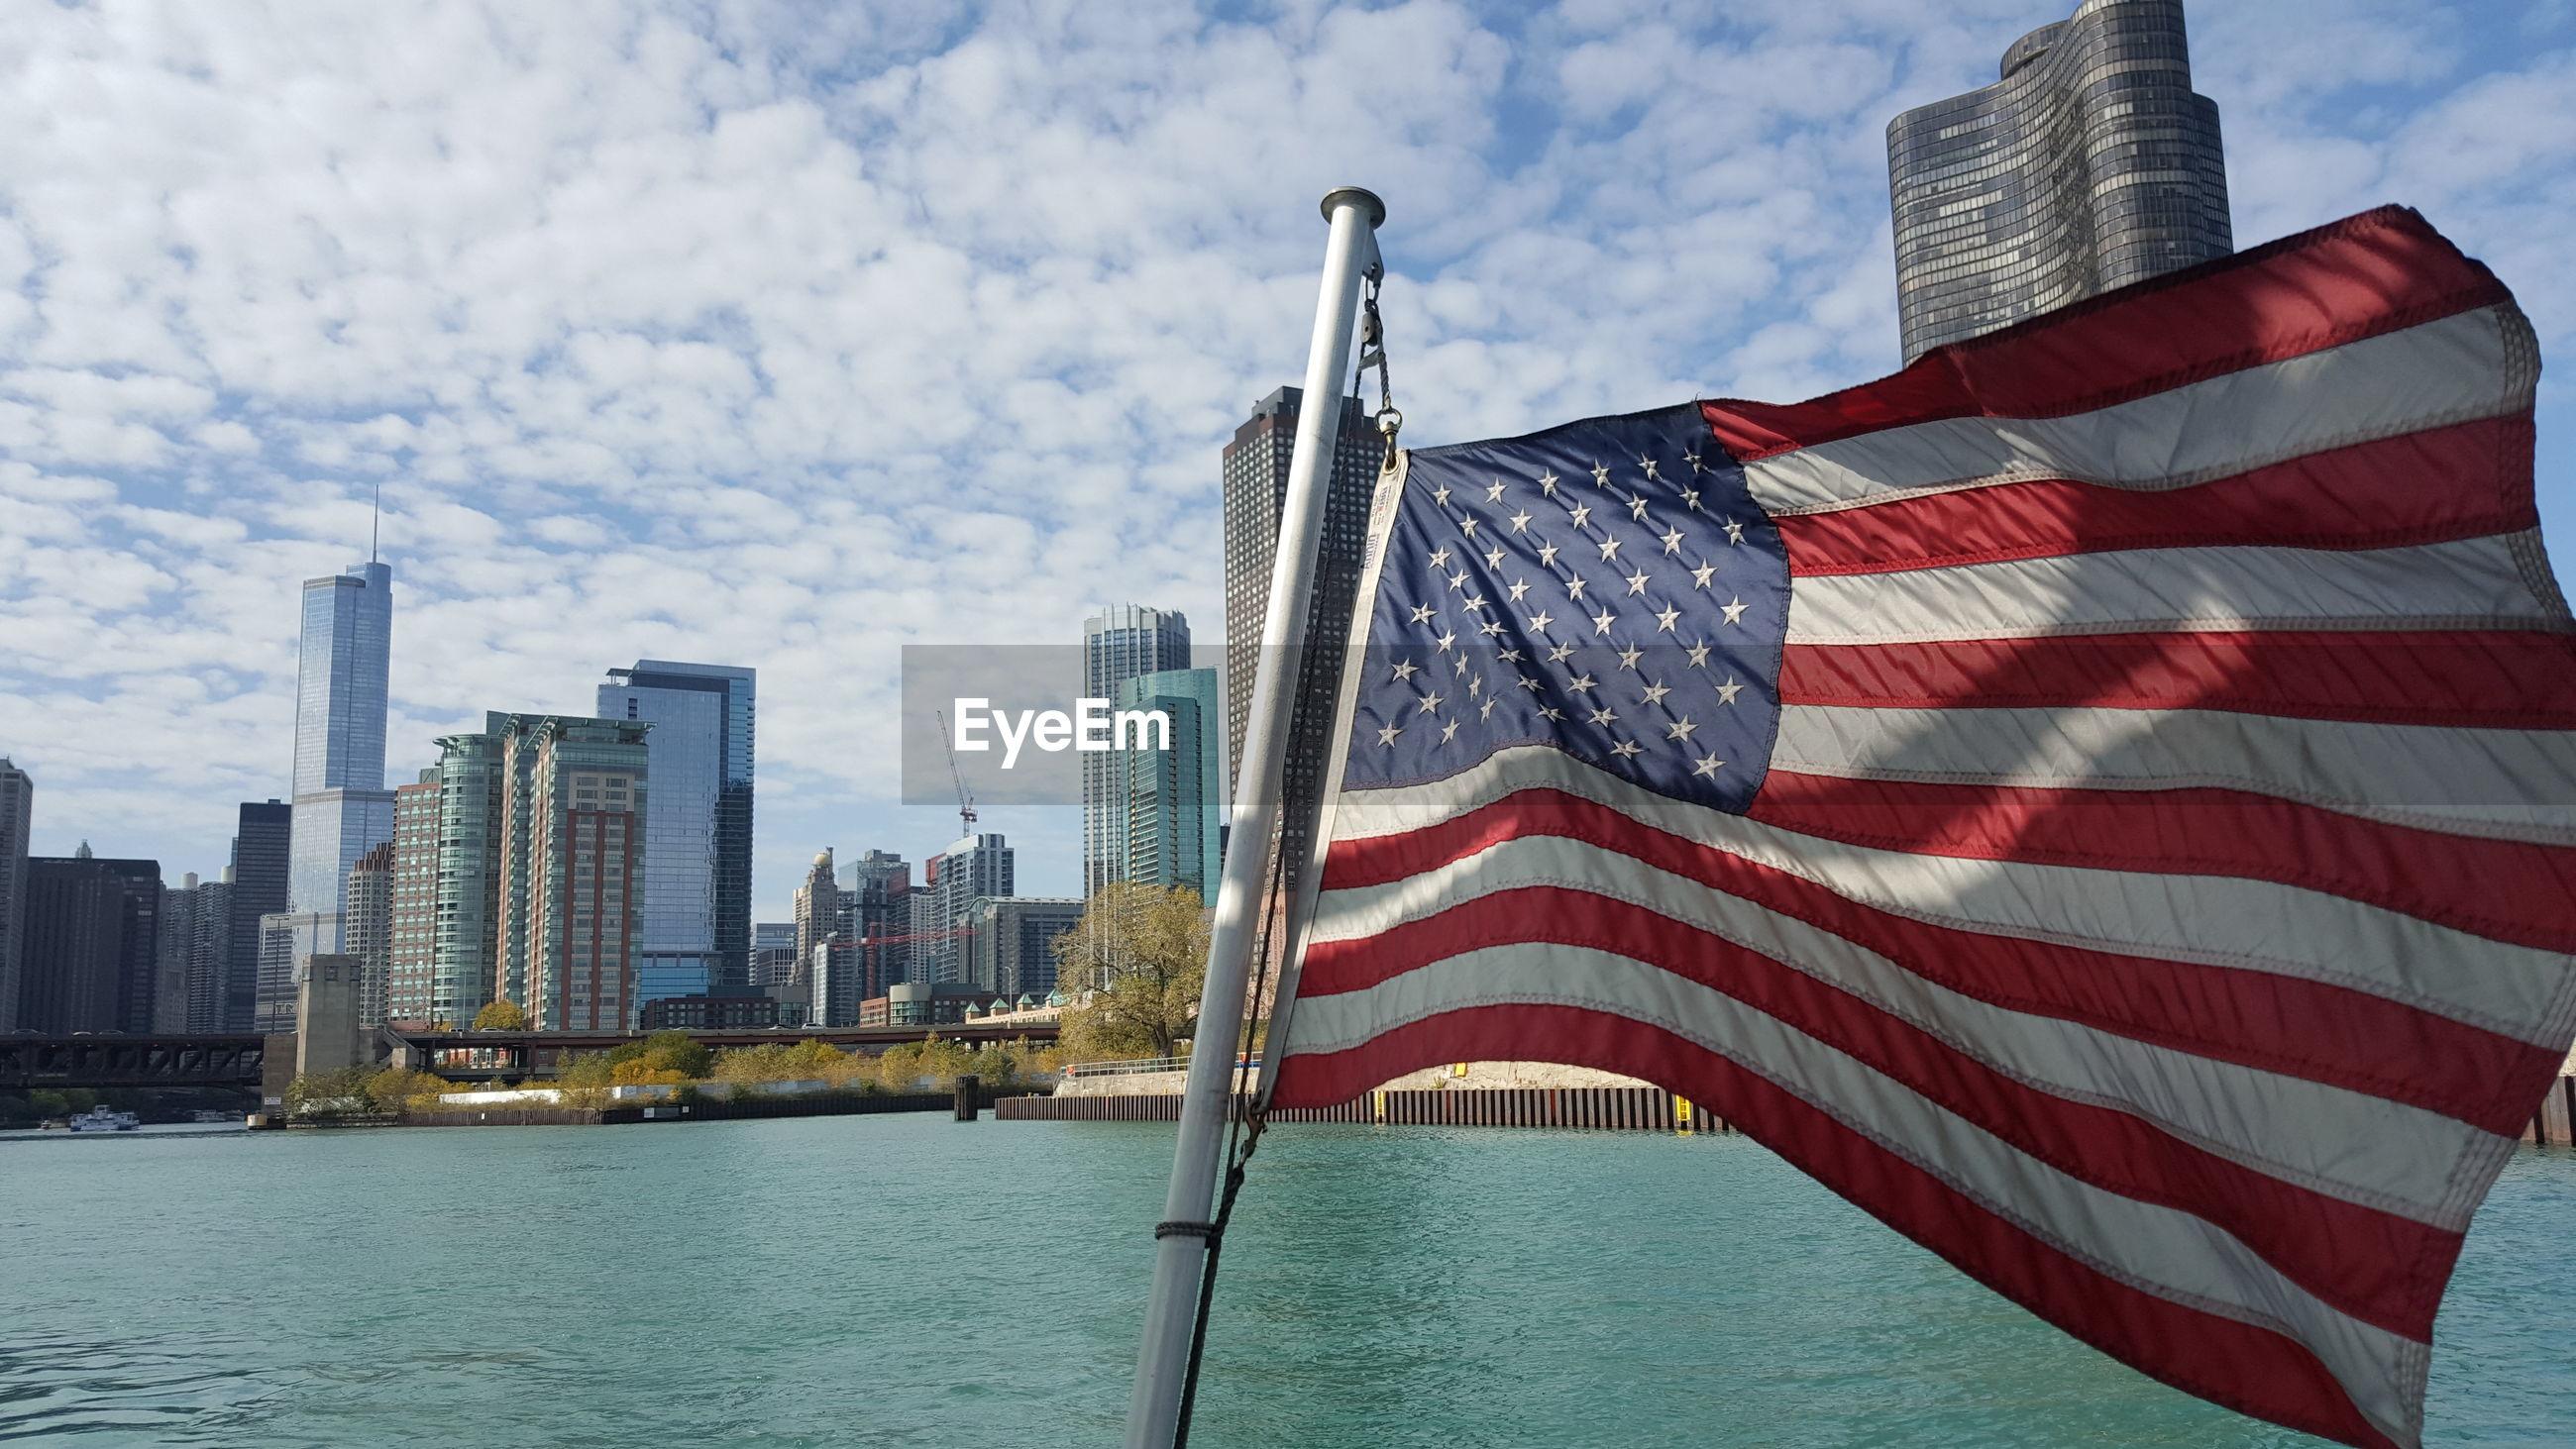 FLAG AGAINST SKY IN CITY SKYLINE AGAINST CLOUDY DAY